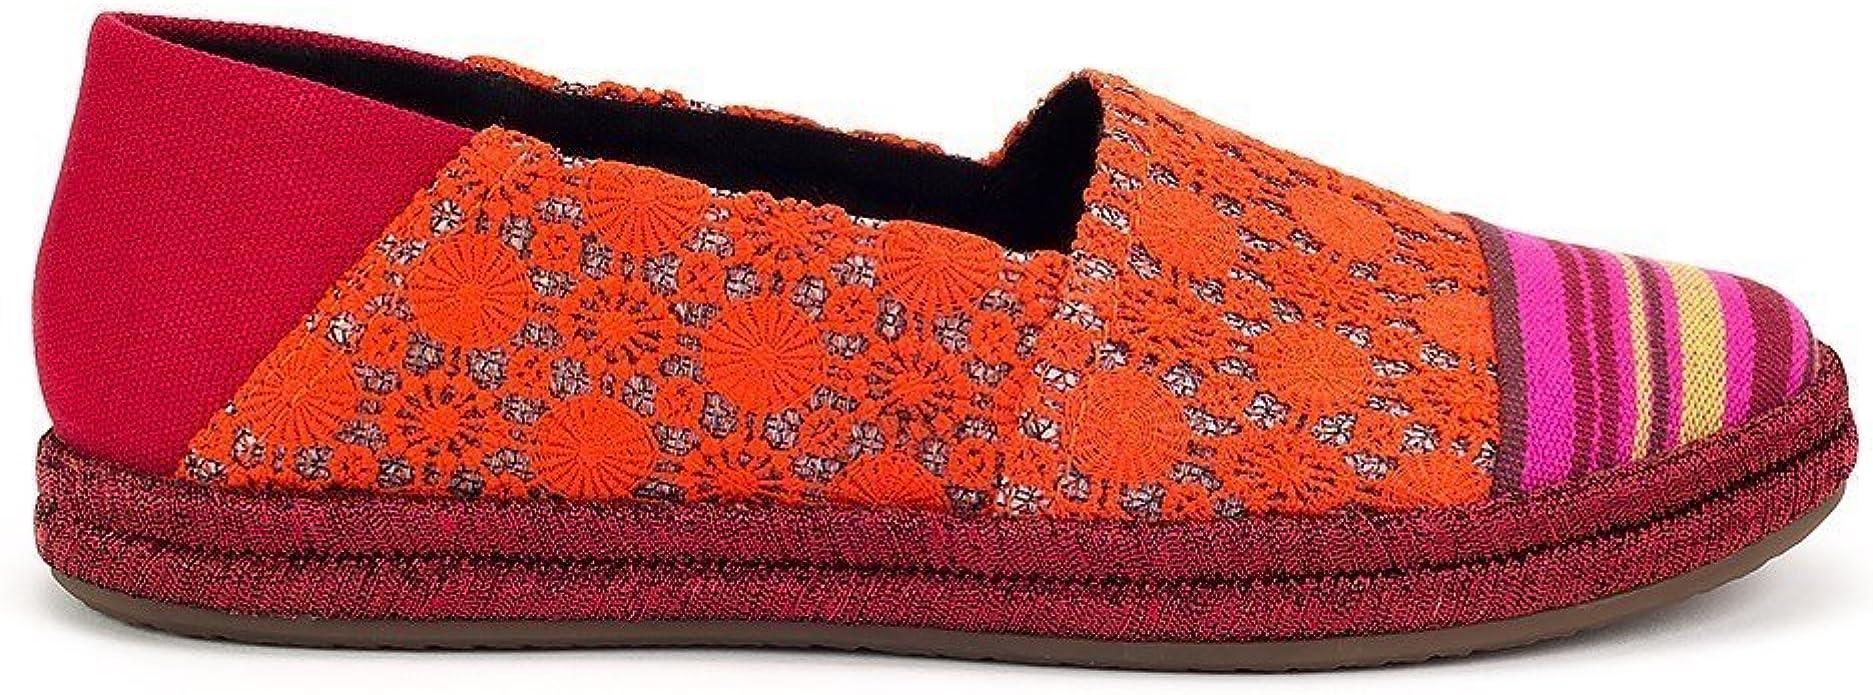 Geox modesty sneaker donna espadrillas slip on 39 coral